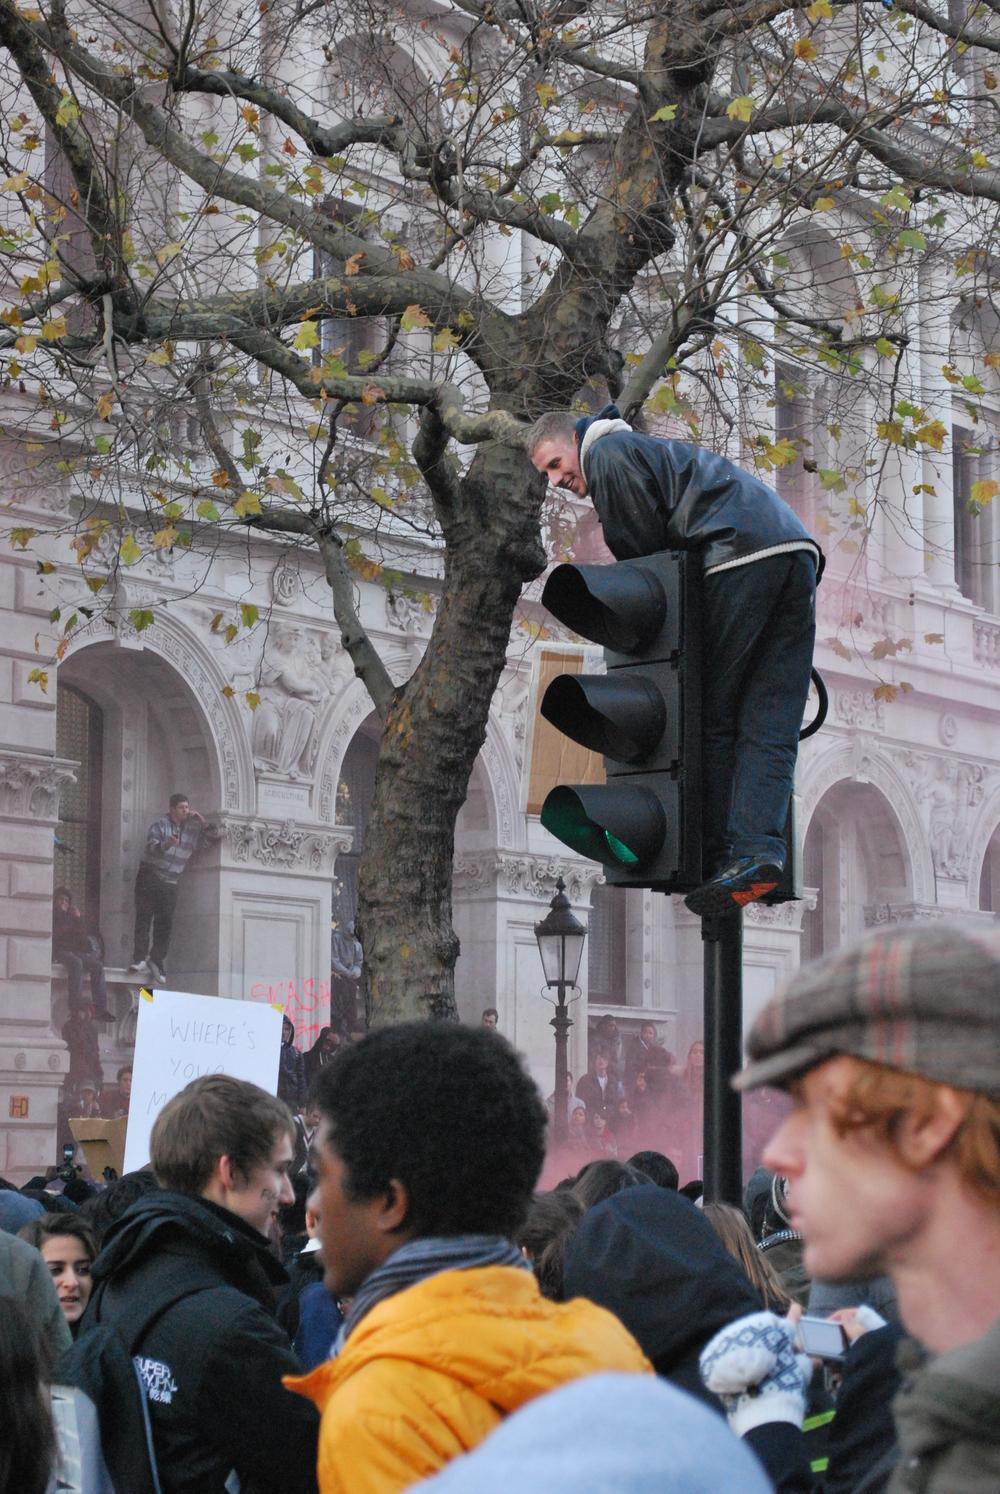 Whitehall, 2010